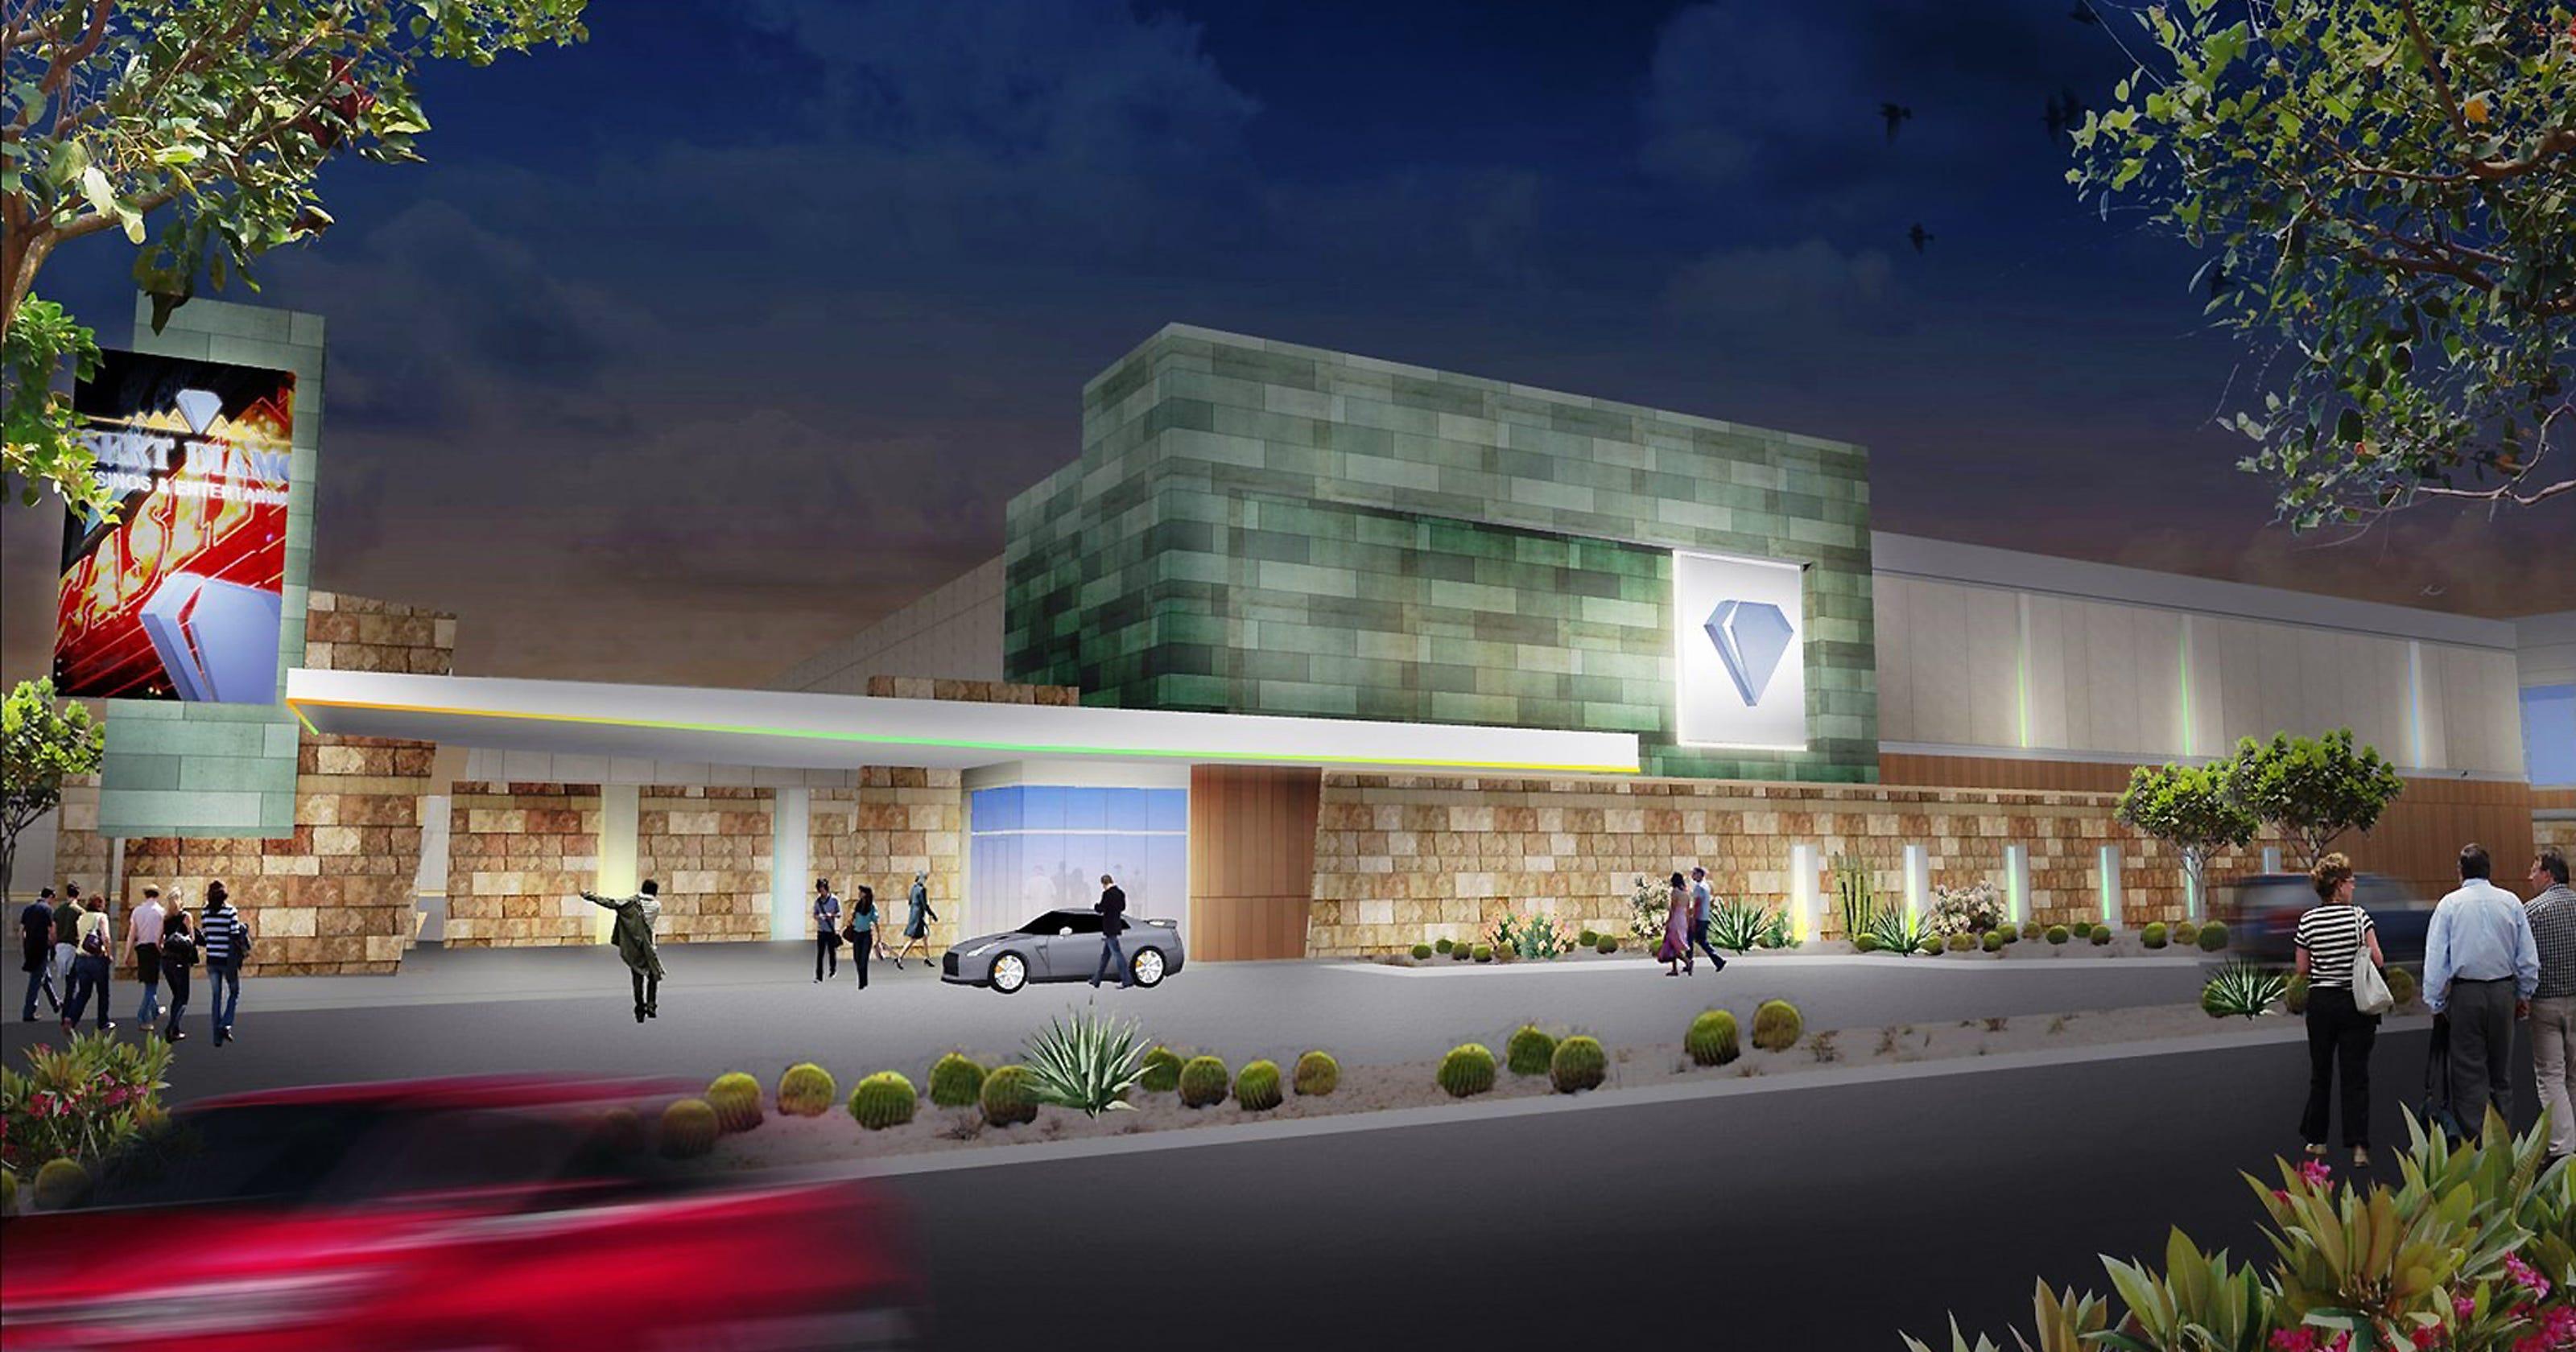 How we got here: the Desert Diamond Casino West Valley